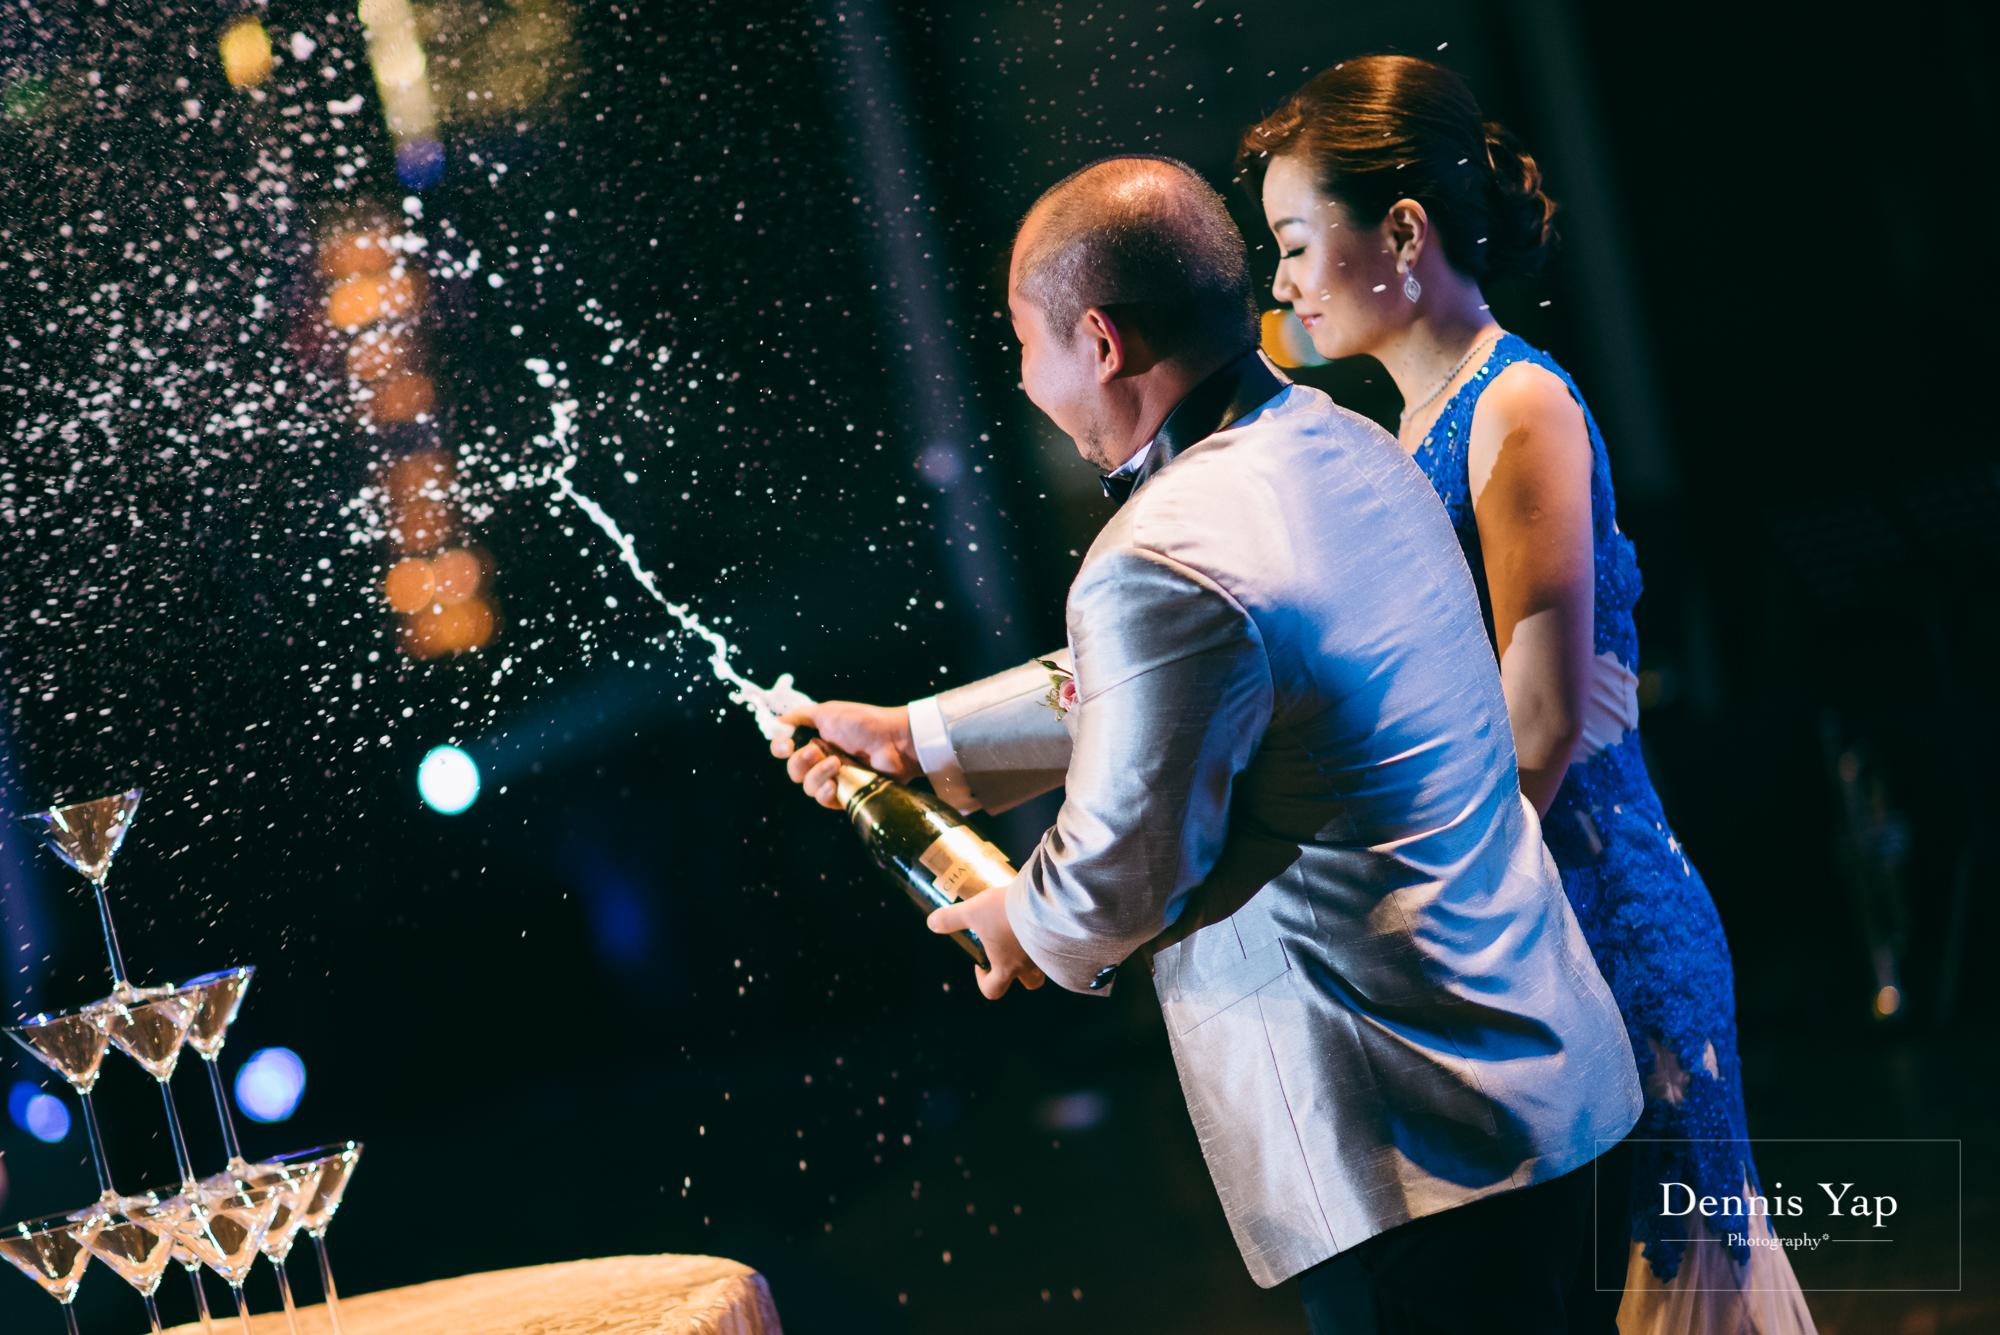 we chard sharon wedding day gate crash majestic hotel kuala lumpur moonlight dennis yap photography malaysia-48.jpg